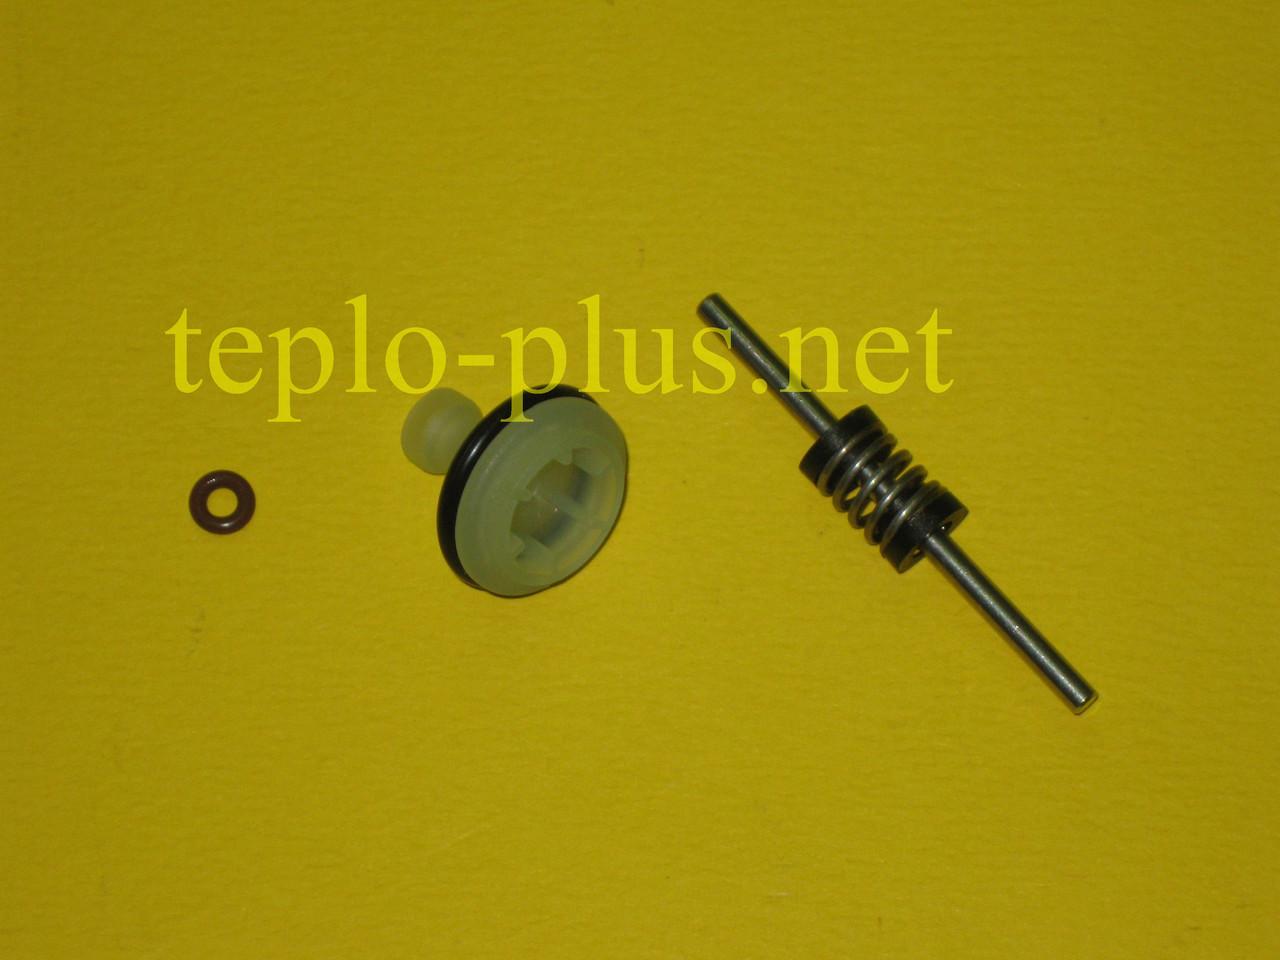 Шток трехходового клапана D003202760 (3003202760) Demrad Atron H24, H28, фото 2